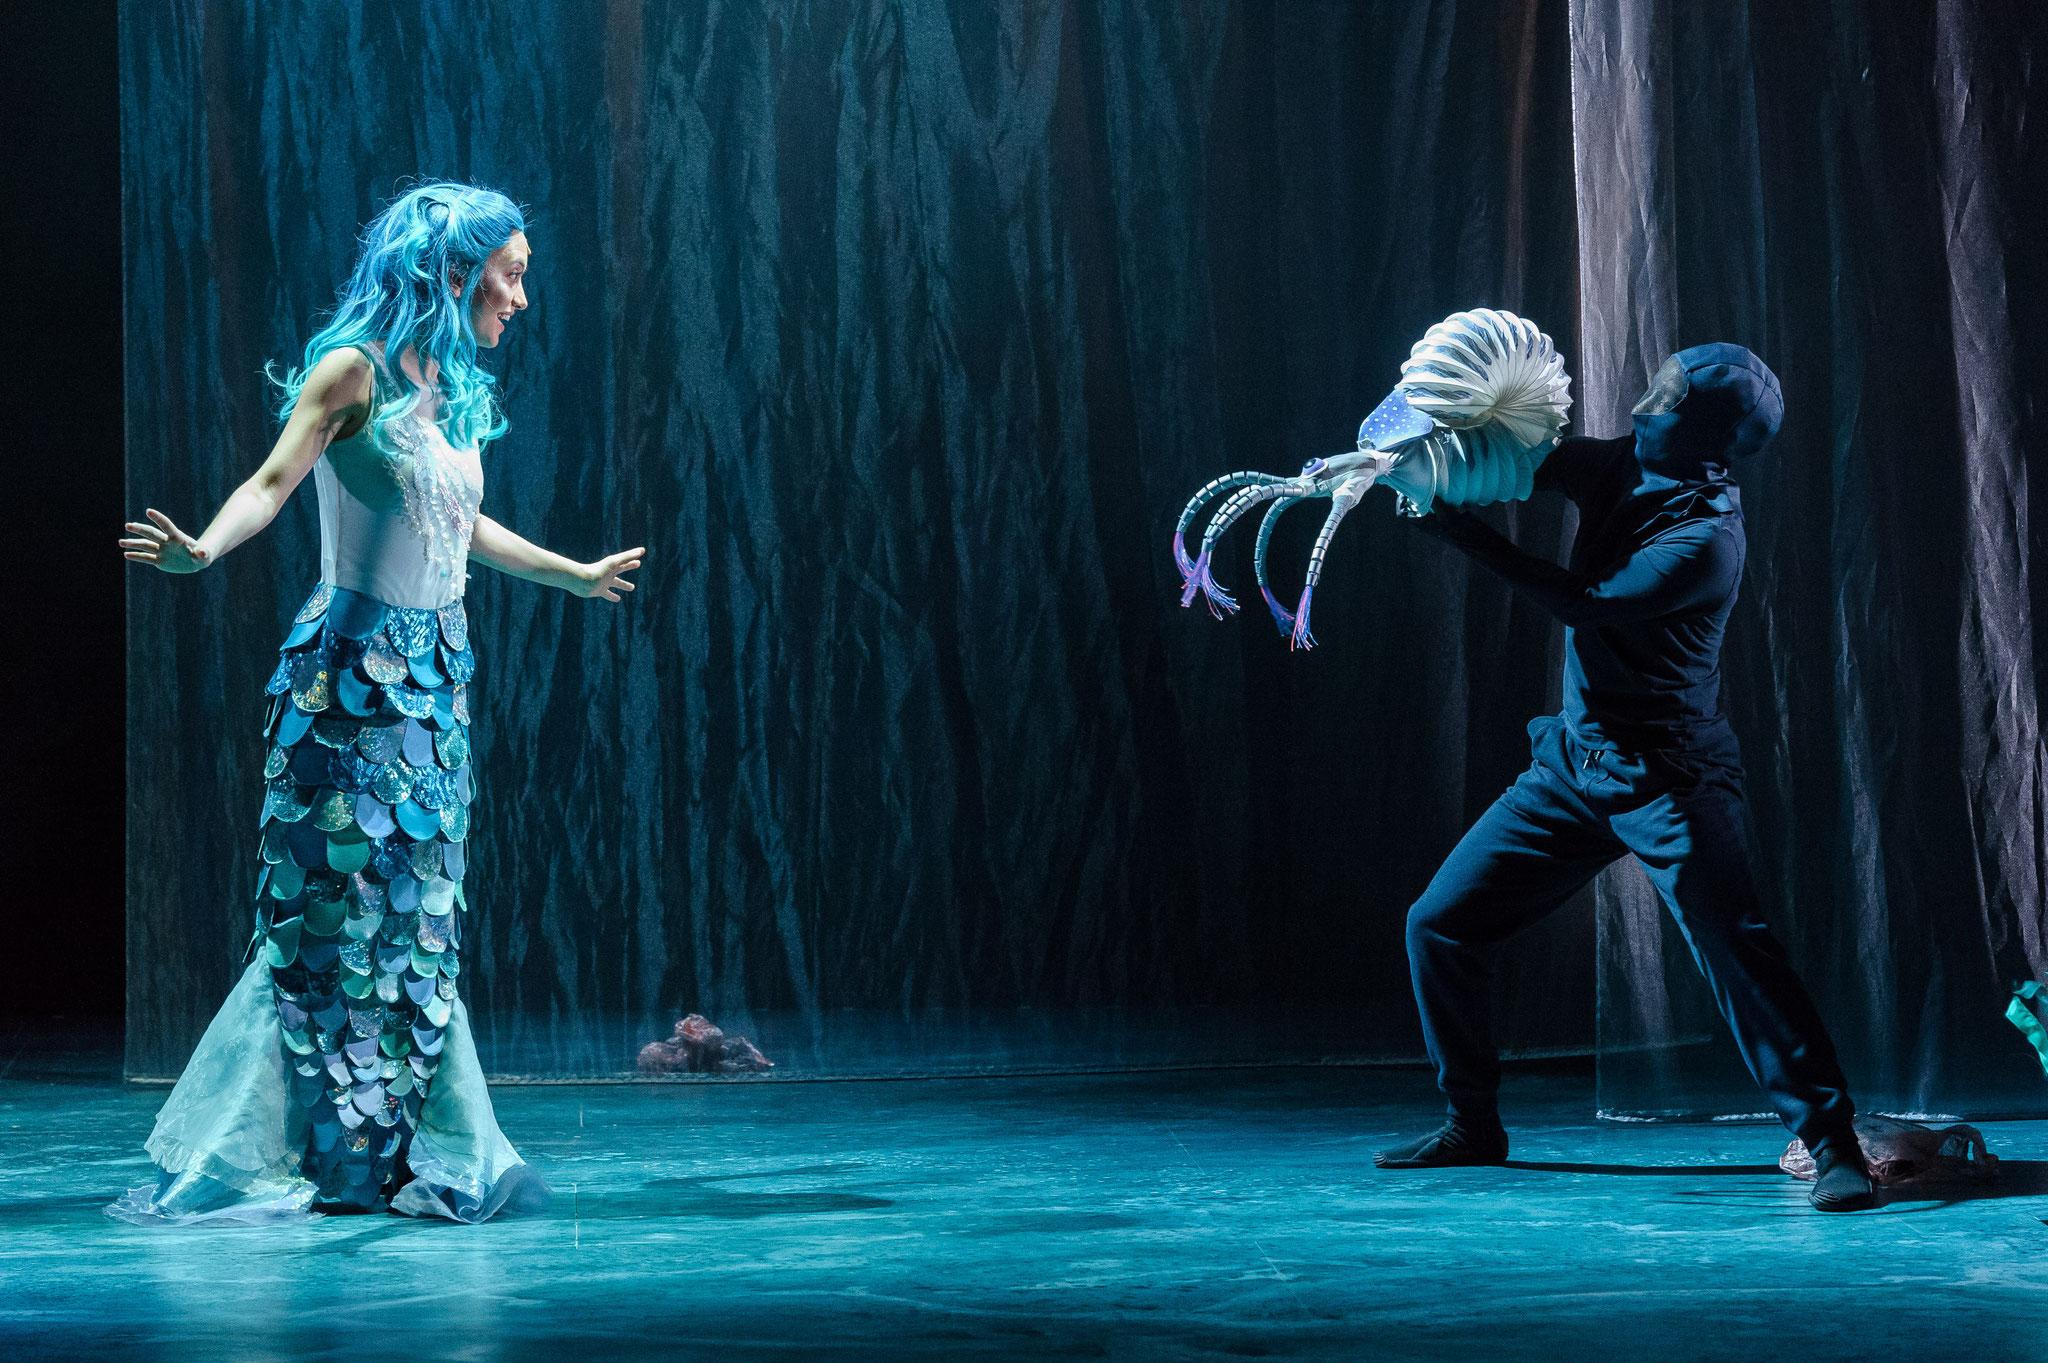 Das kleine Meermädchen, 2018, Theater der Jugend, Wien, Fotos: Rita Newman